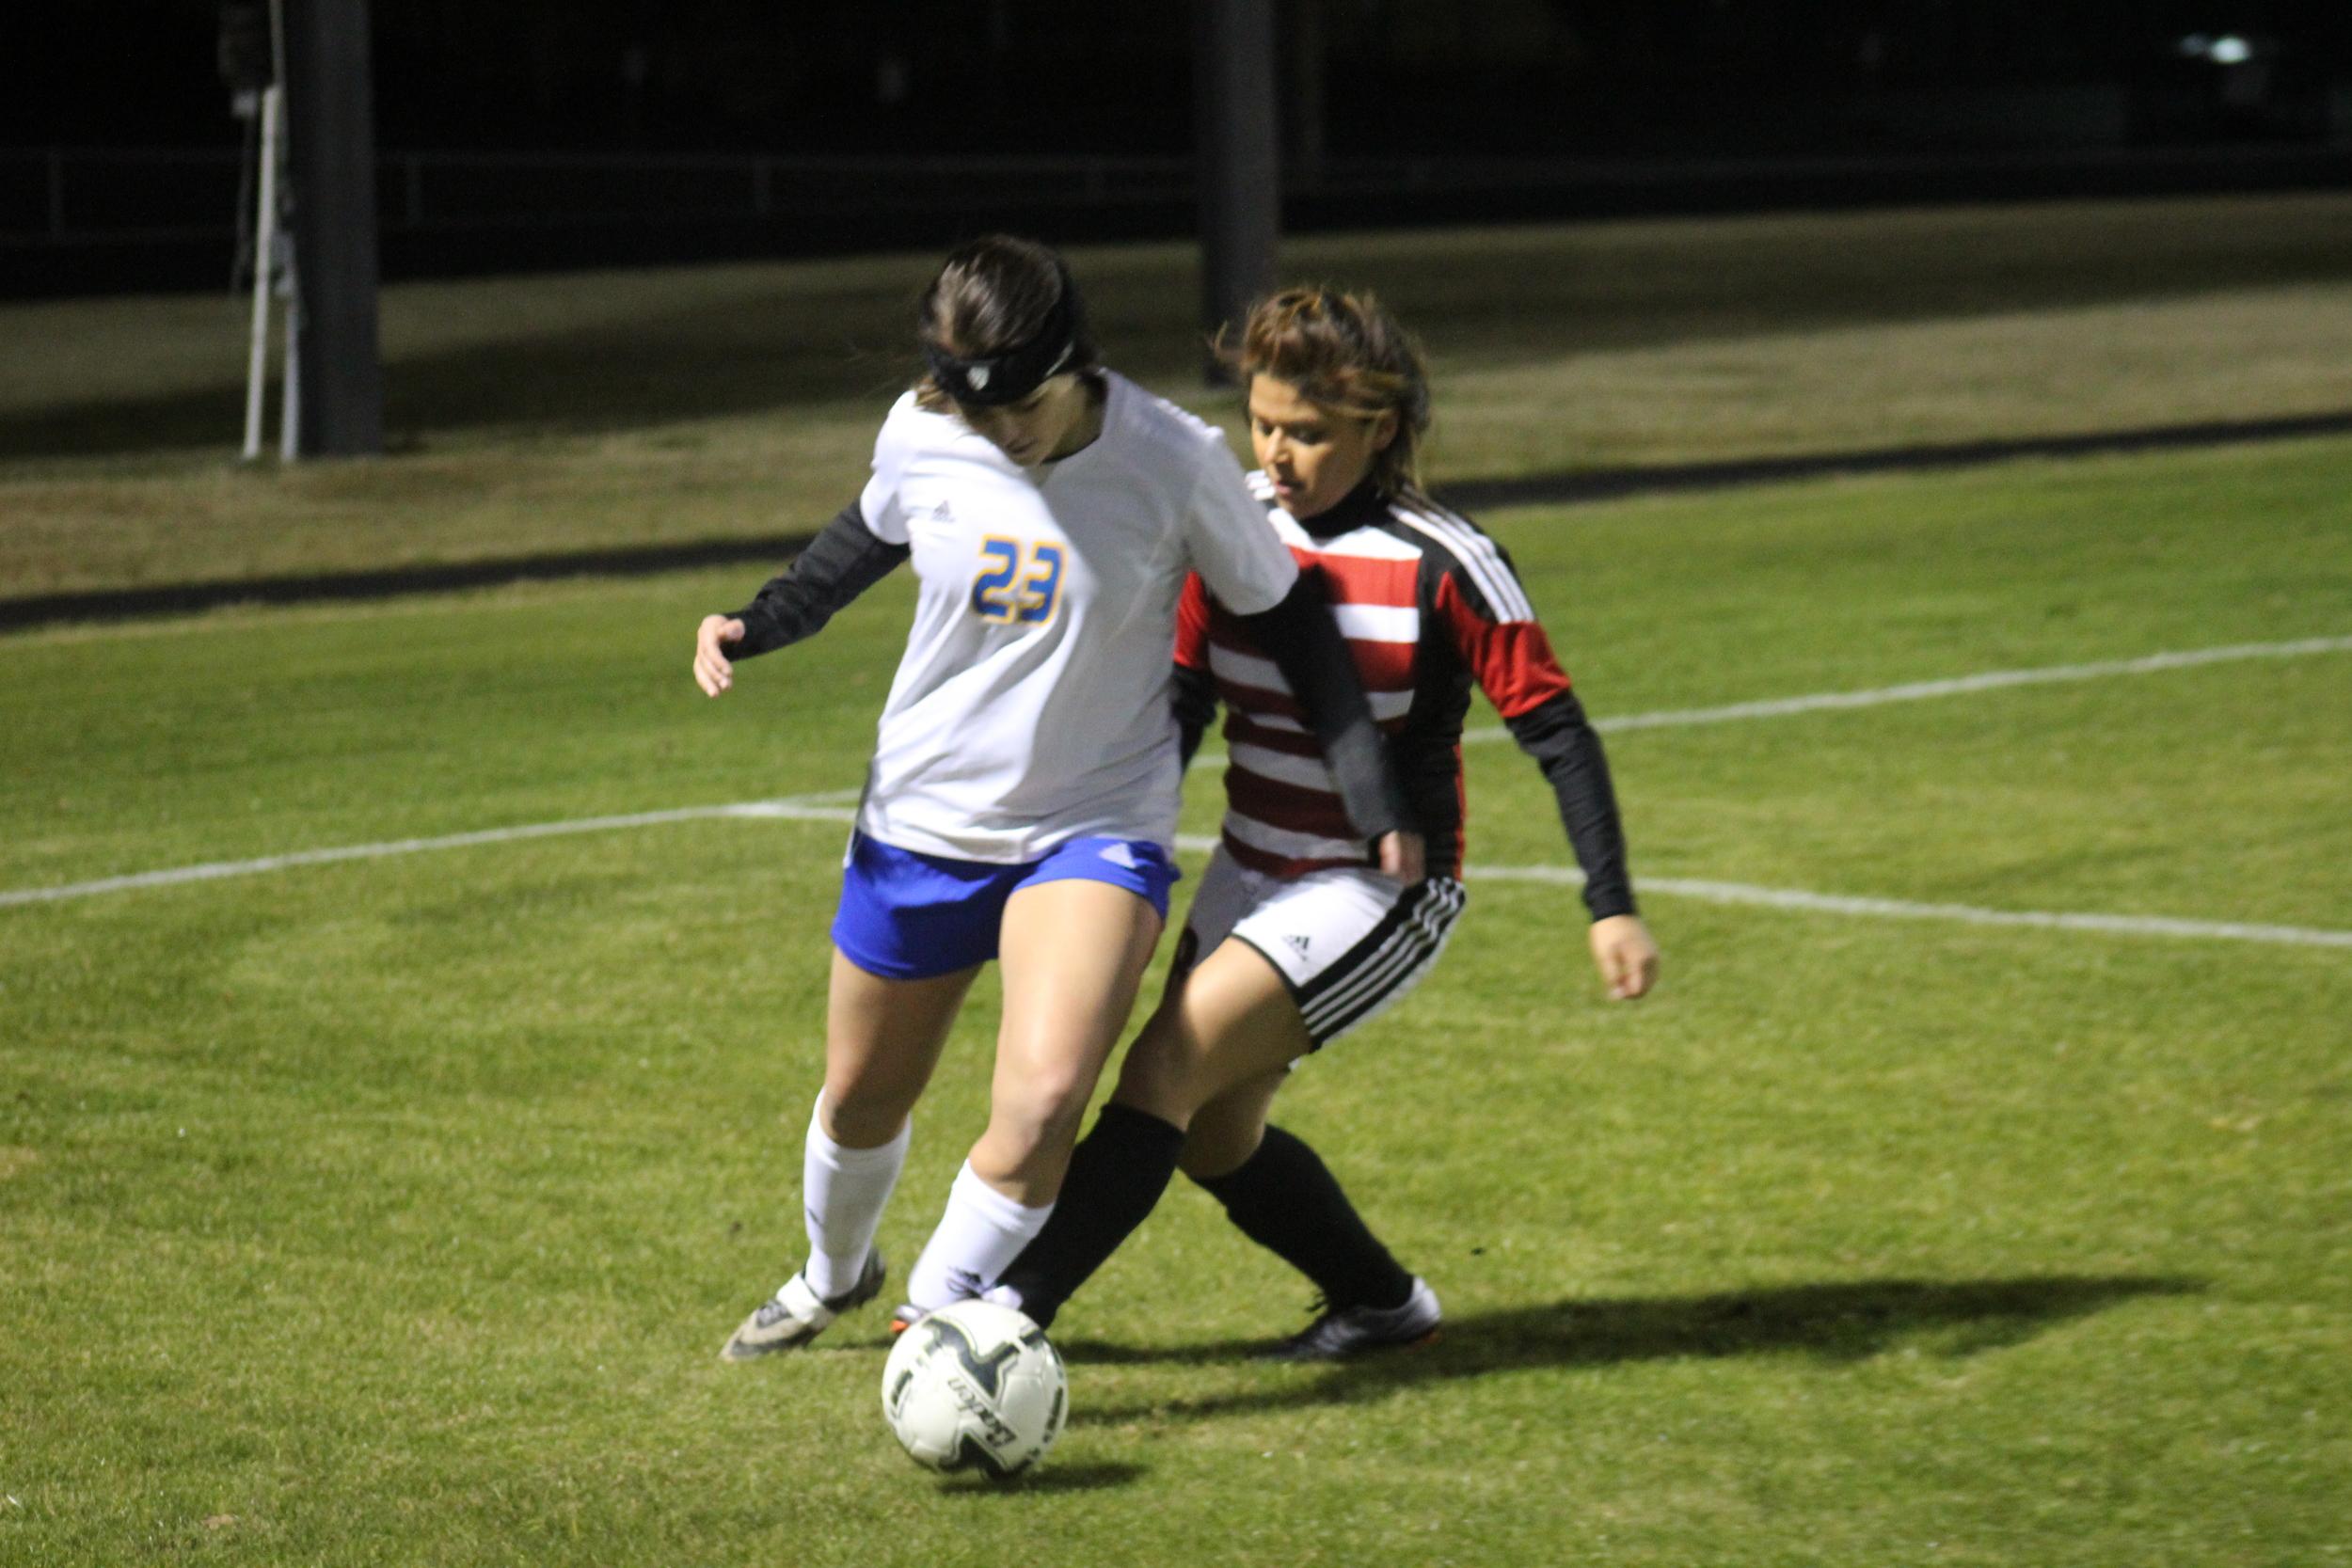 Karlee Alexander Fights Through a Greenville Defender